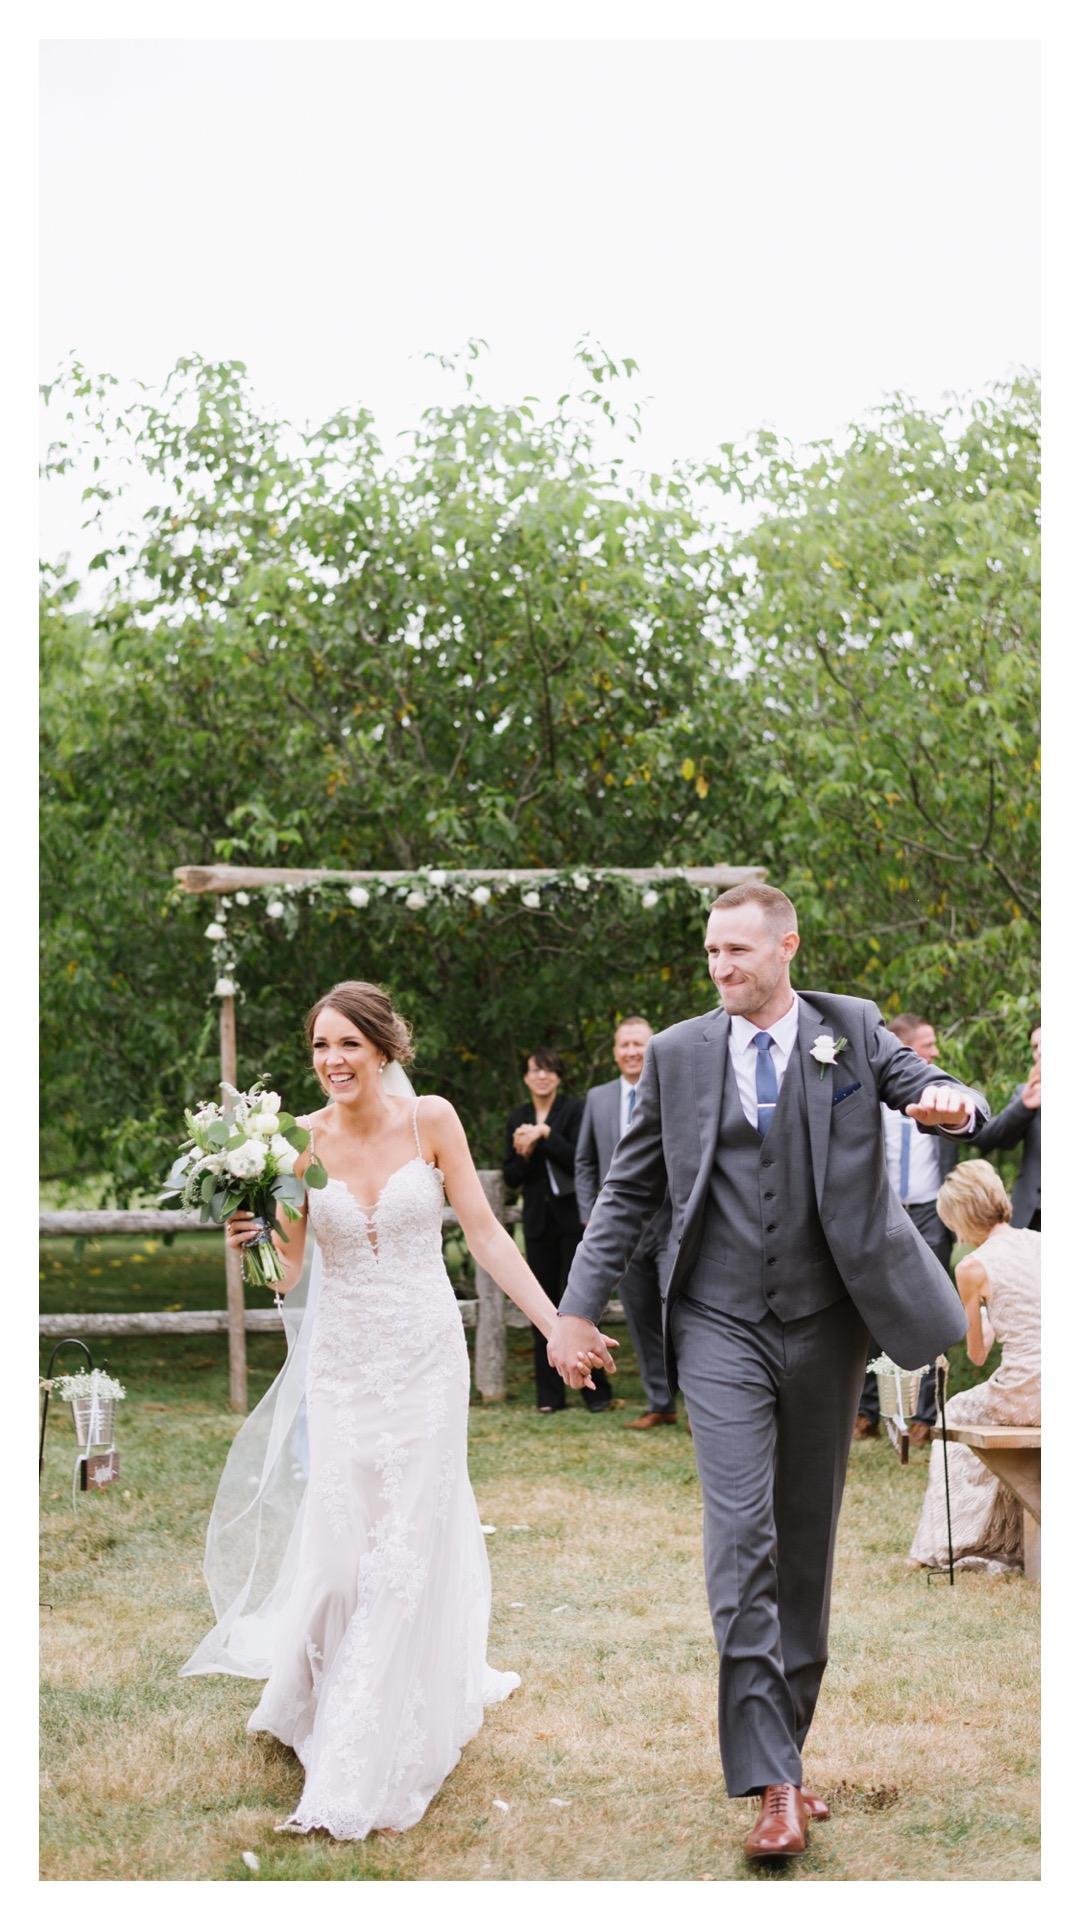 Megan & Beau: Wedding Day Previews | Nova Scotia Wedding Photographer